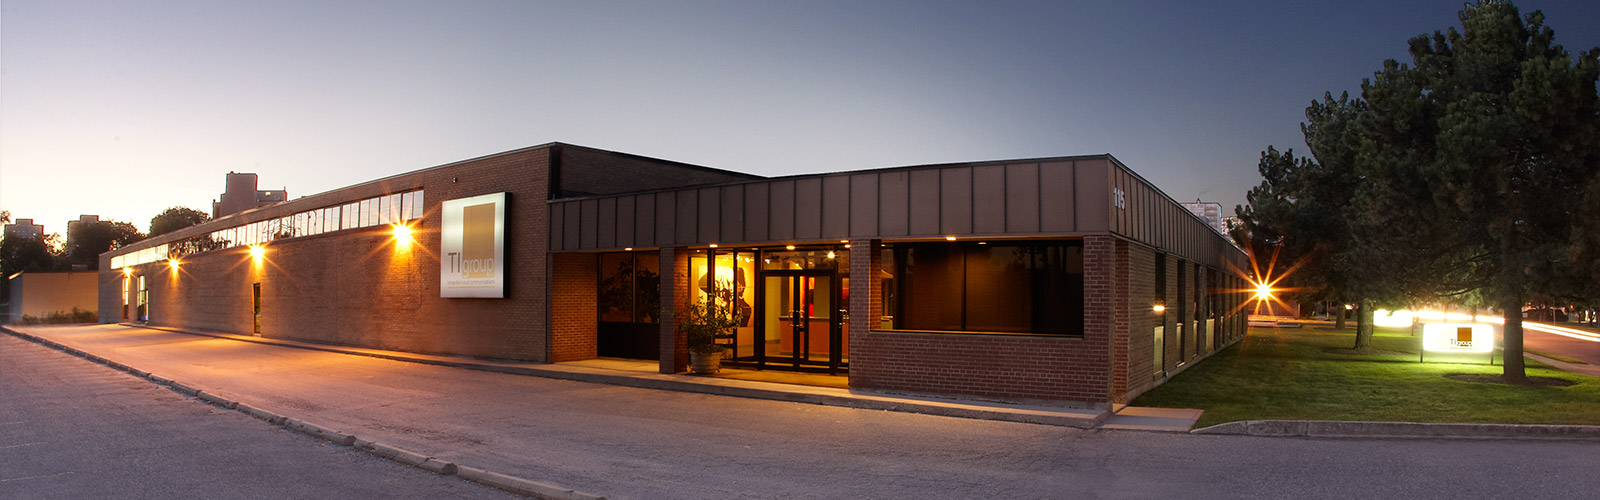 TI Group Facility Main Building